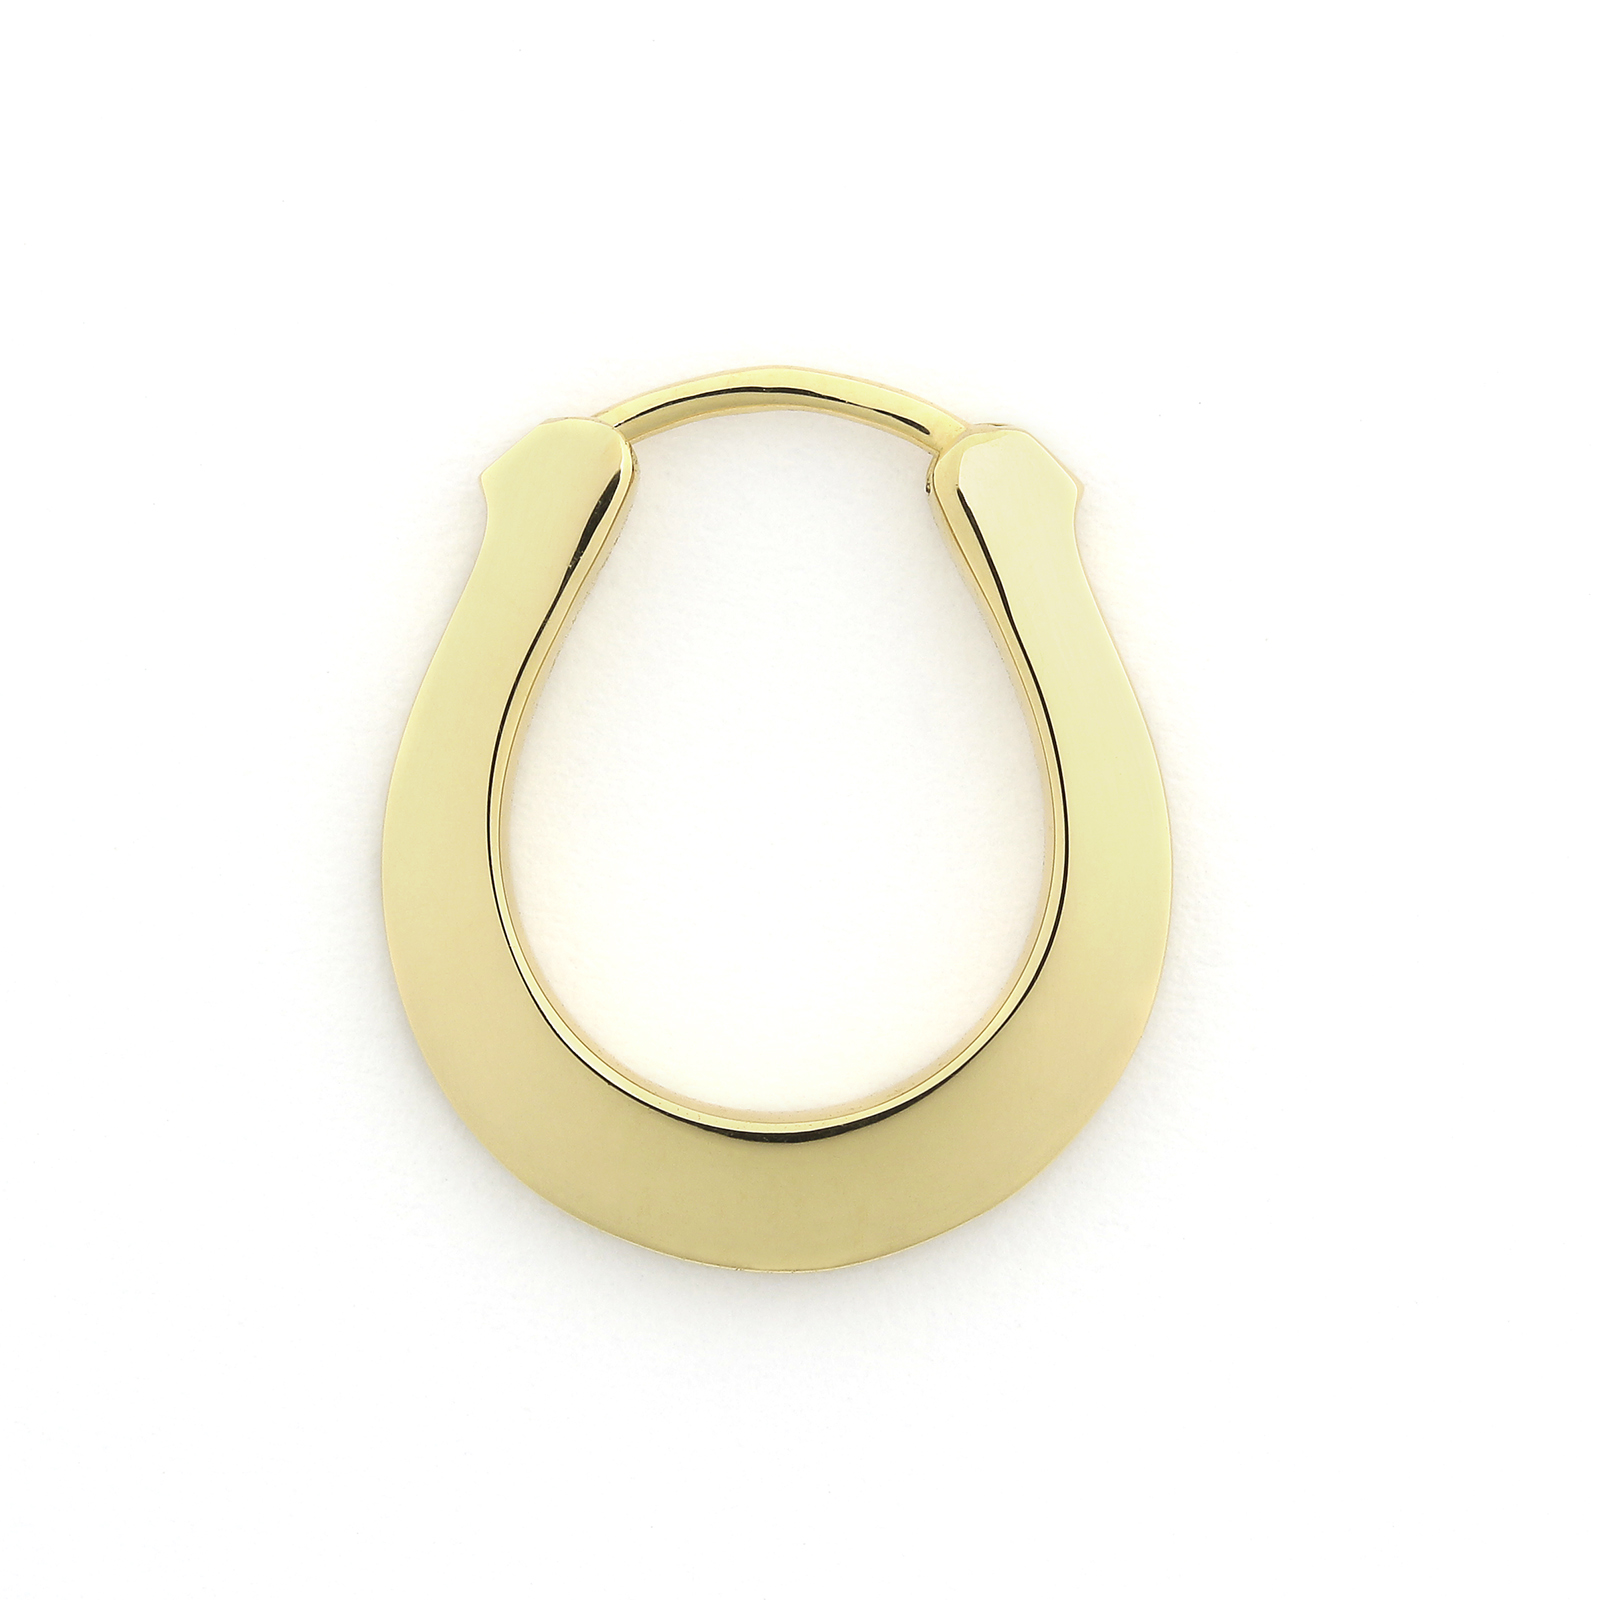 Horseshoe Hoop Pierce - K18Yellow Gold